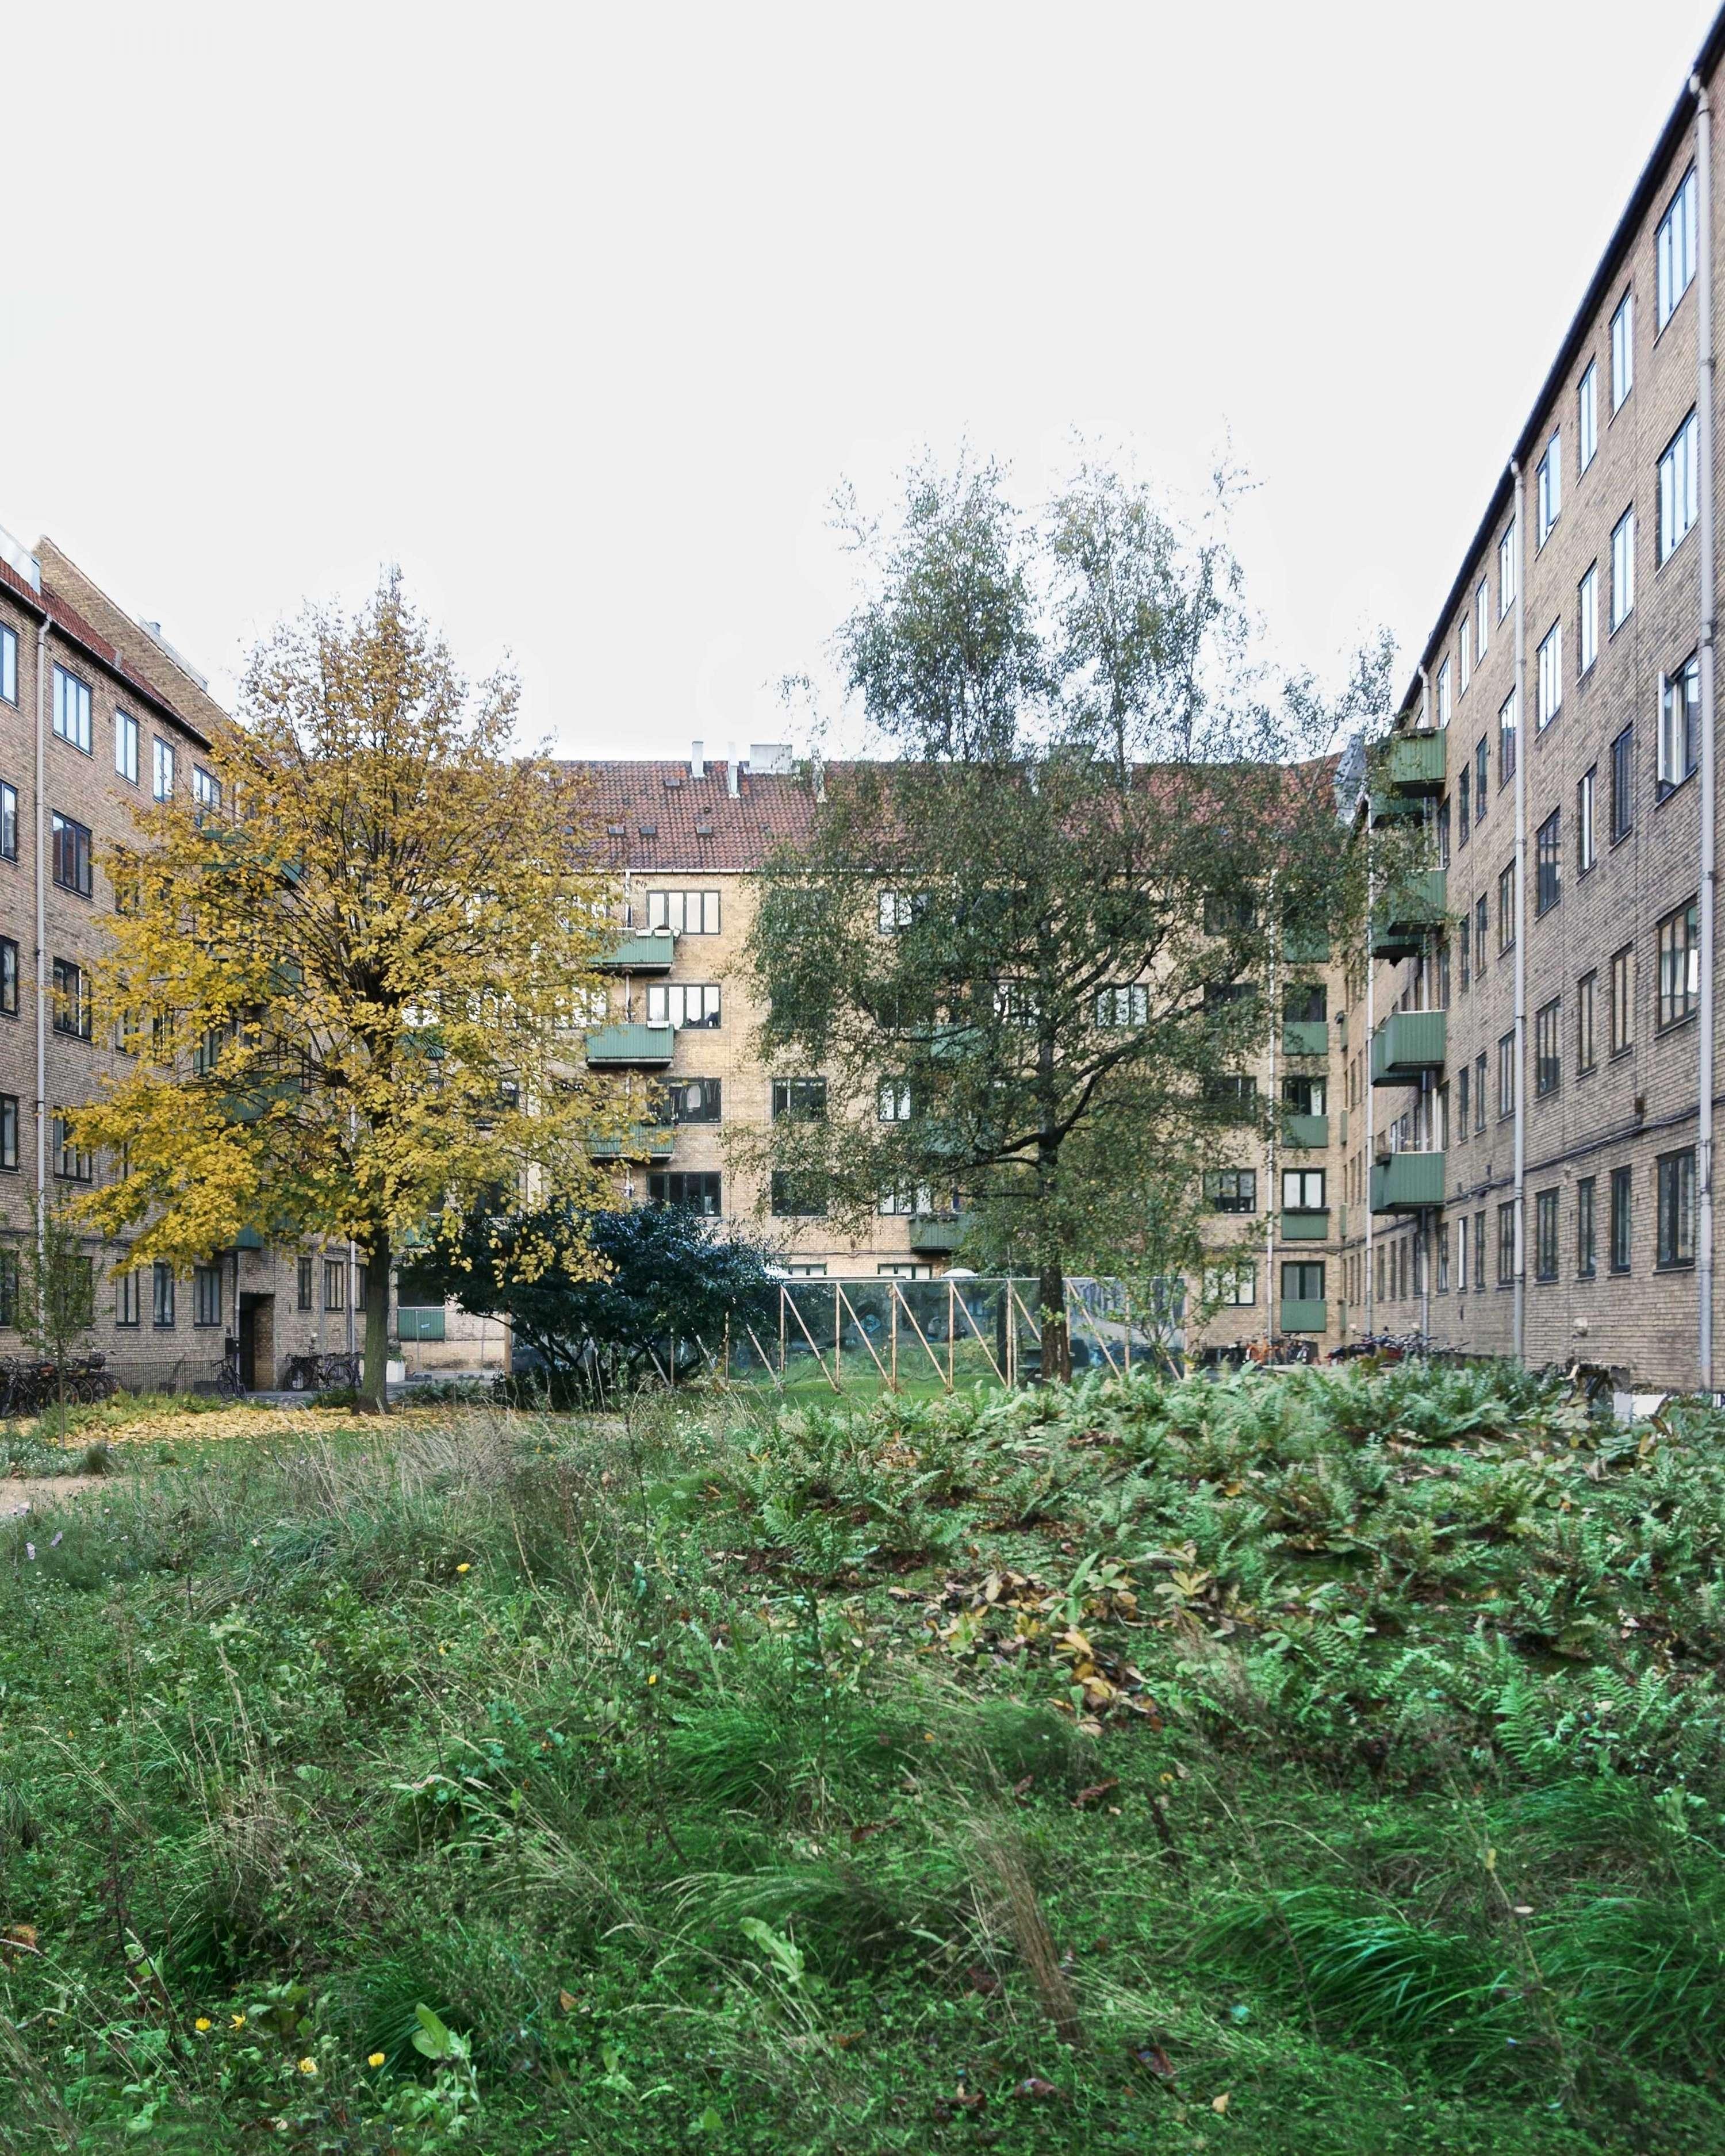 Nørrehus